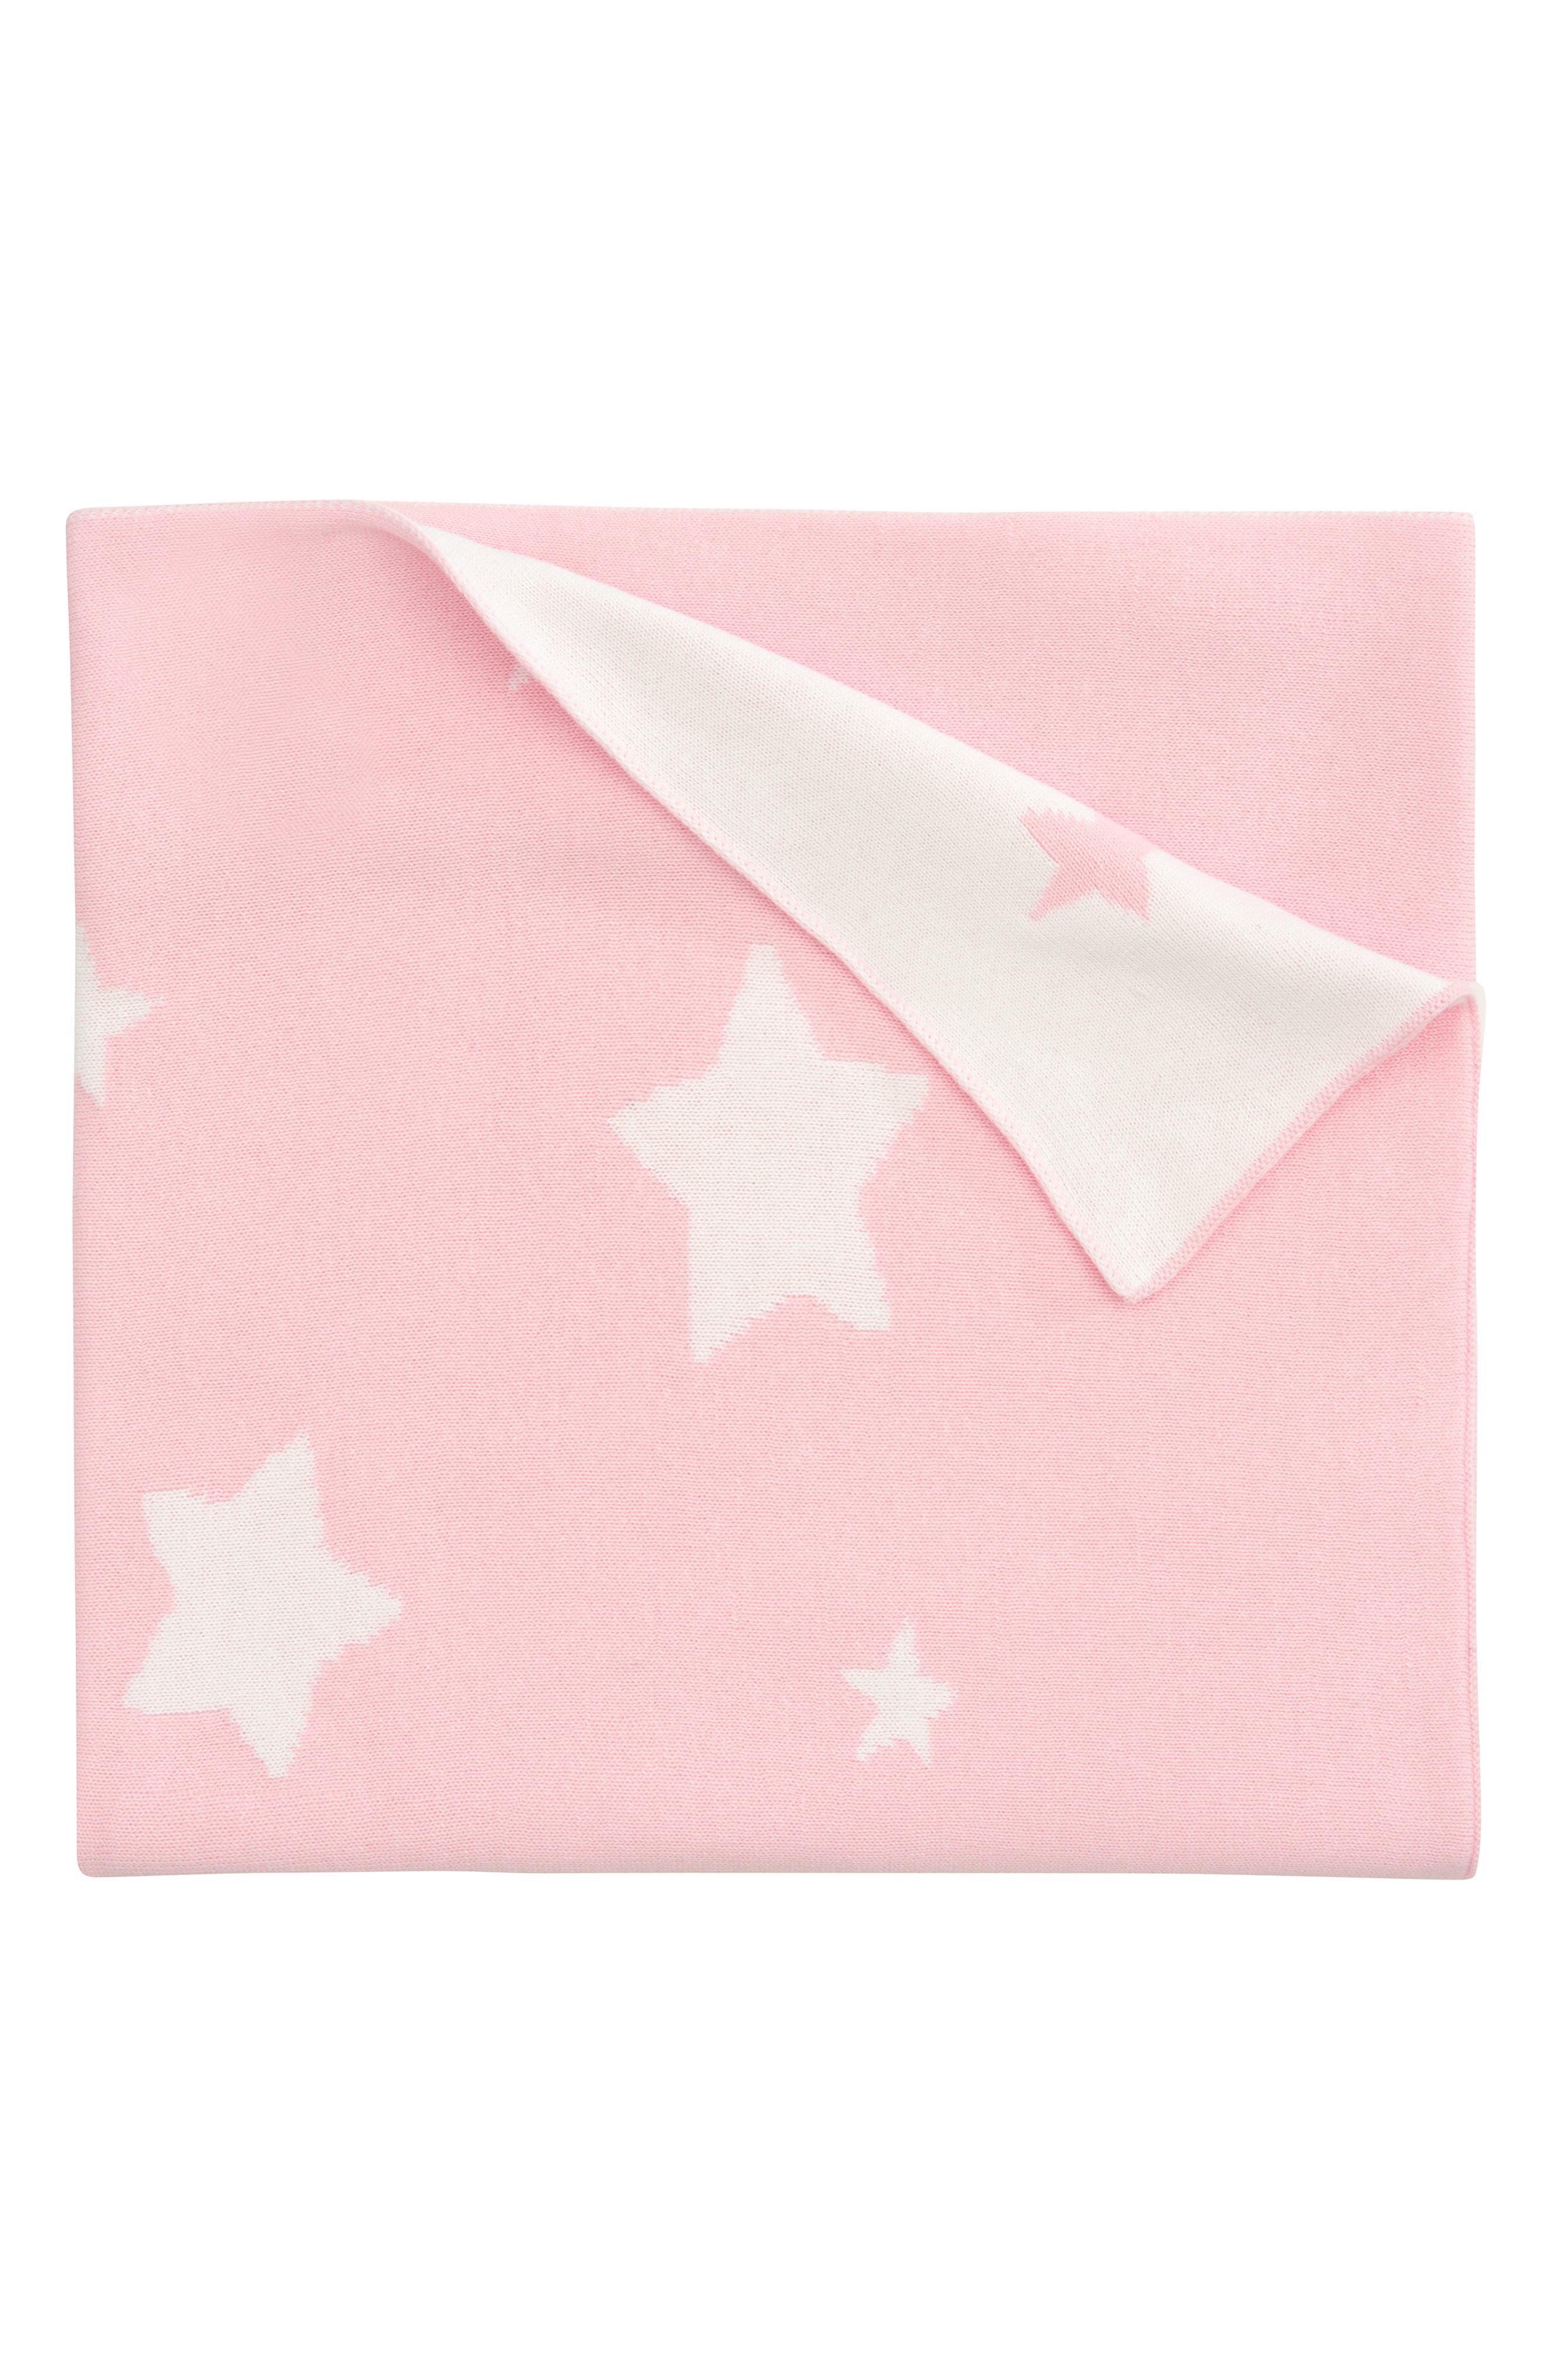 Main Image - Elegant Baby 'Star' Knit Blanket